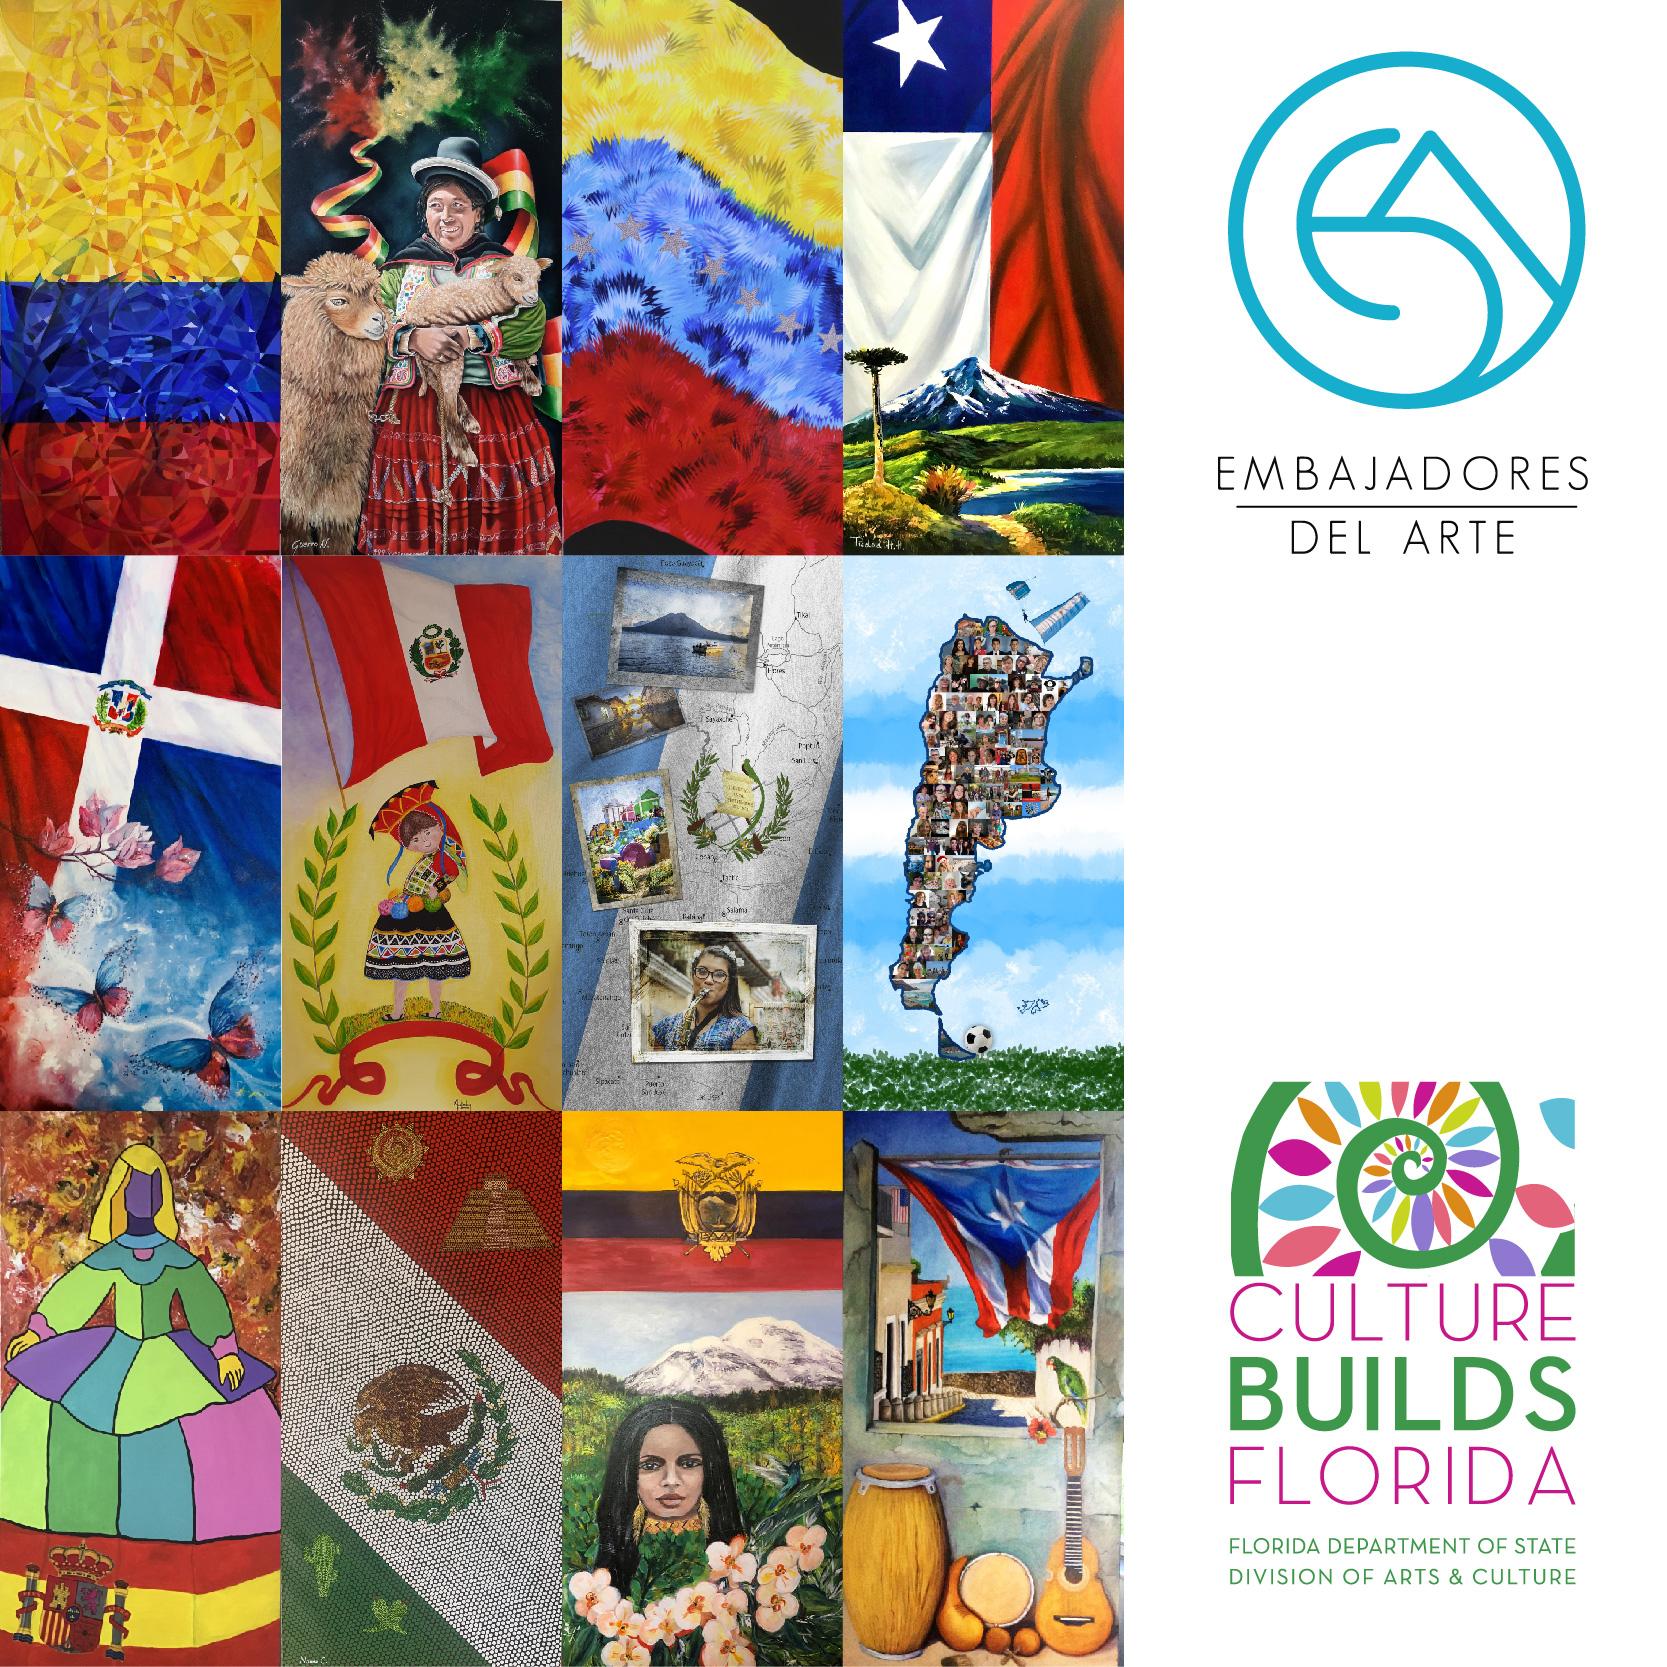 A collage of paintings by members of Embajadores del Arte